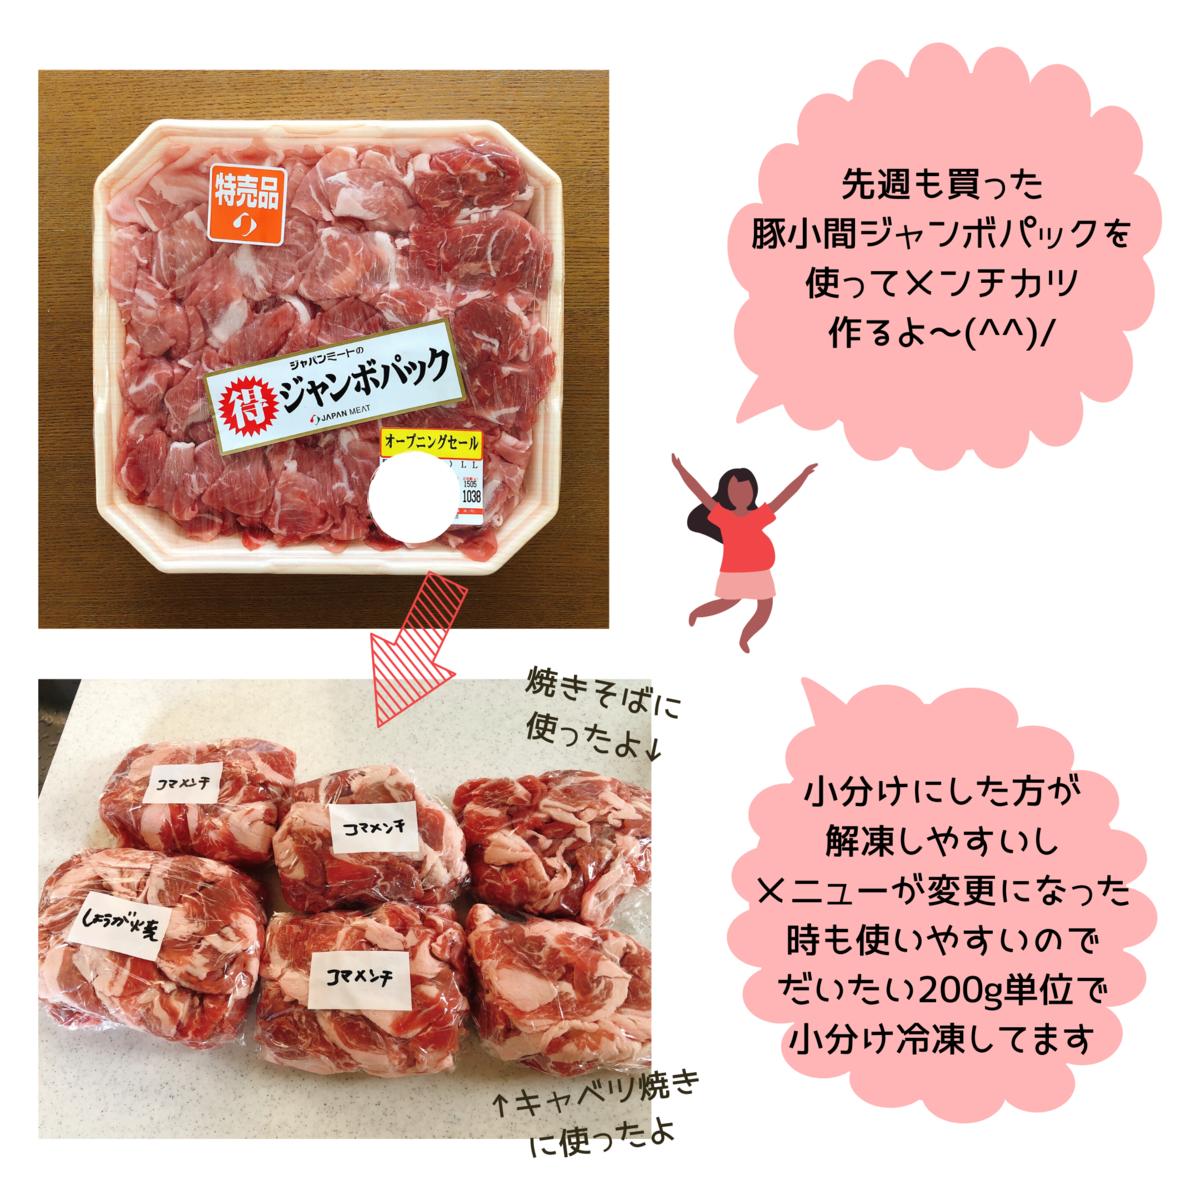 f:id:ku-chan5649:20200415102937p:plain